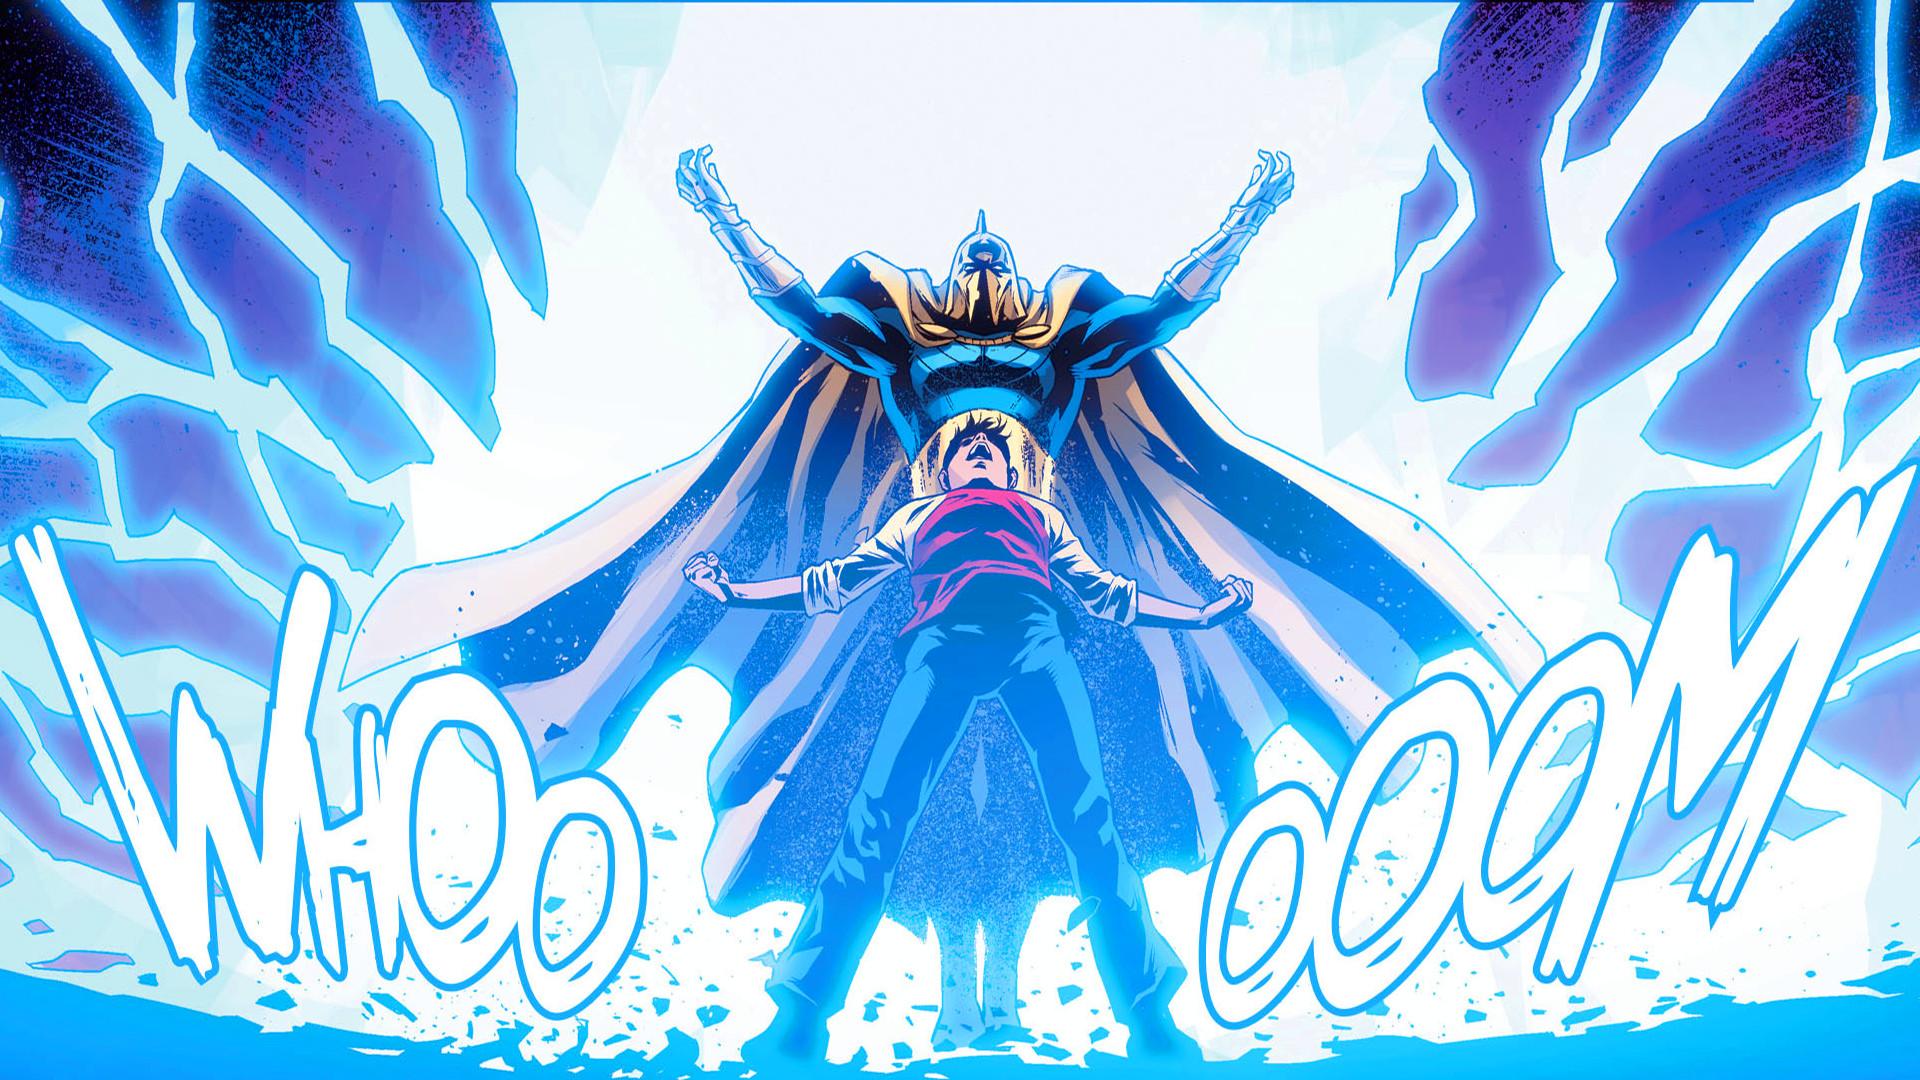 General DC Comics Shazam Doctor Fate Injustice God's among us  comic books superhero comics Billy